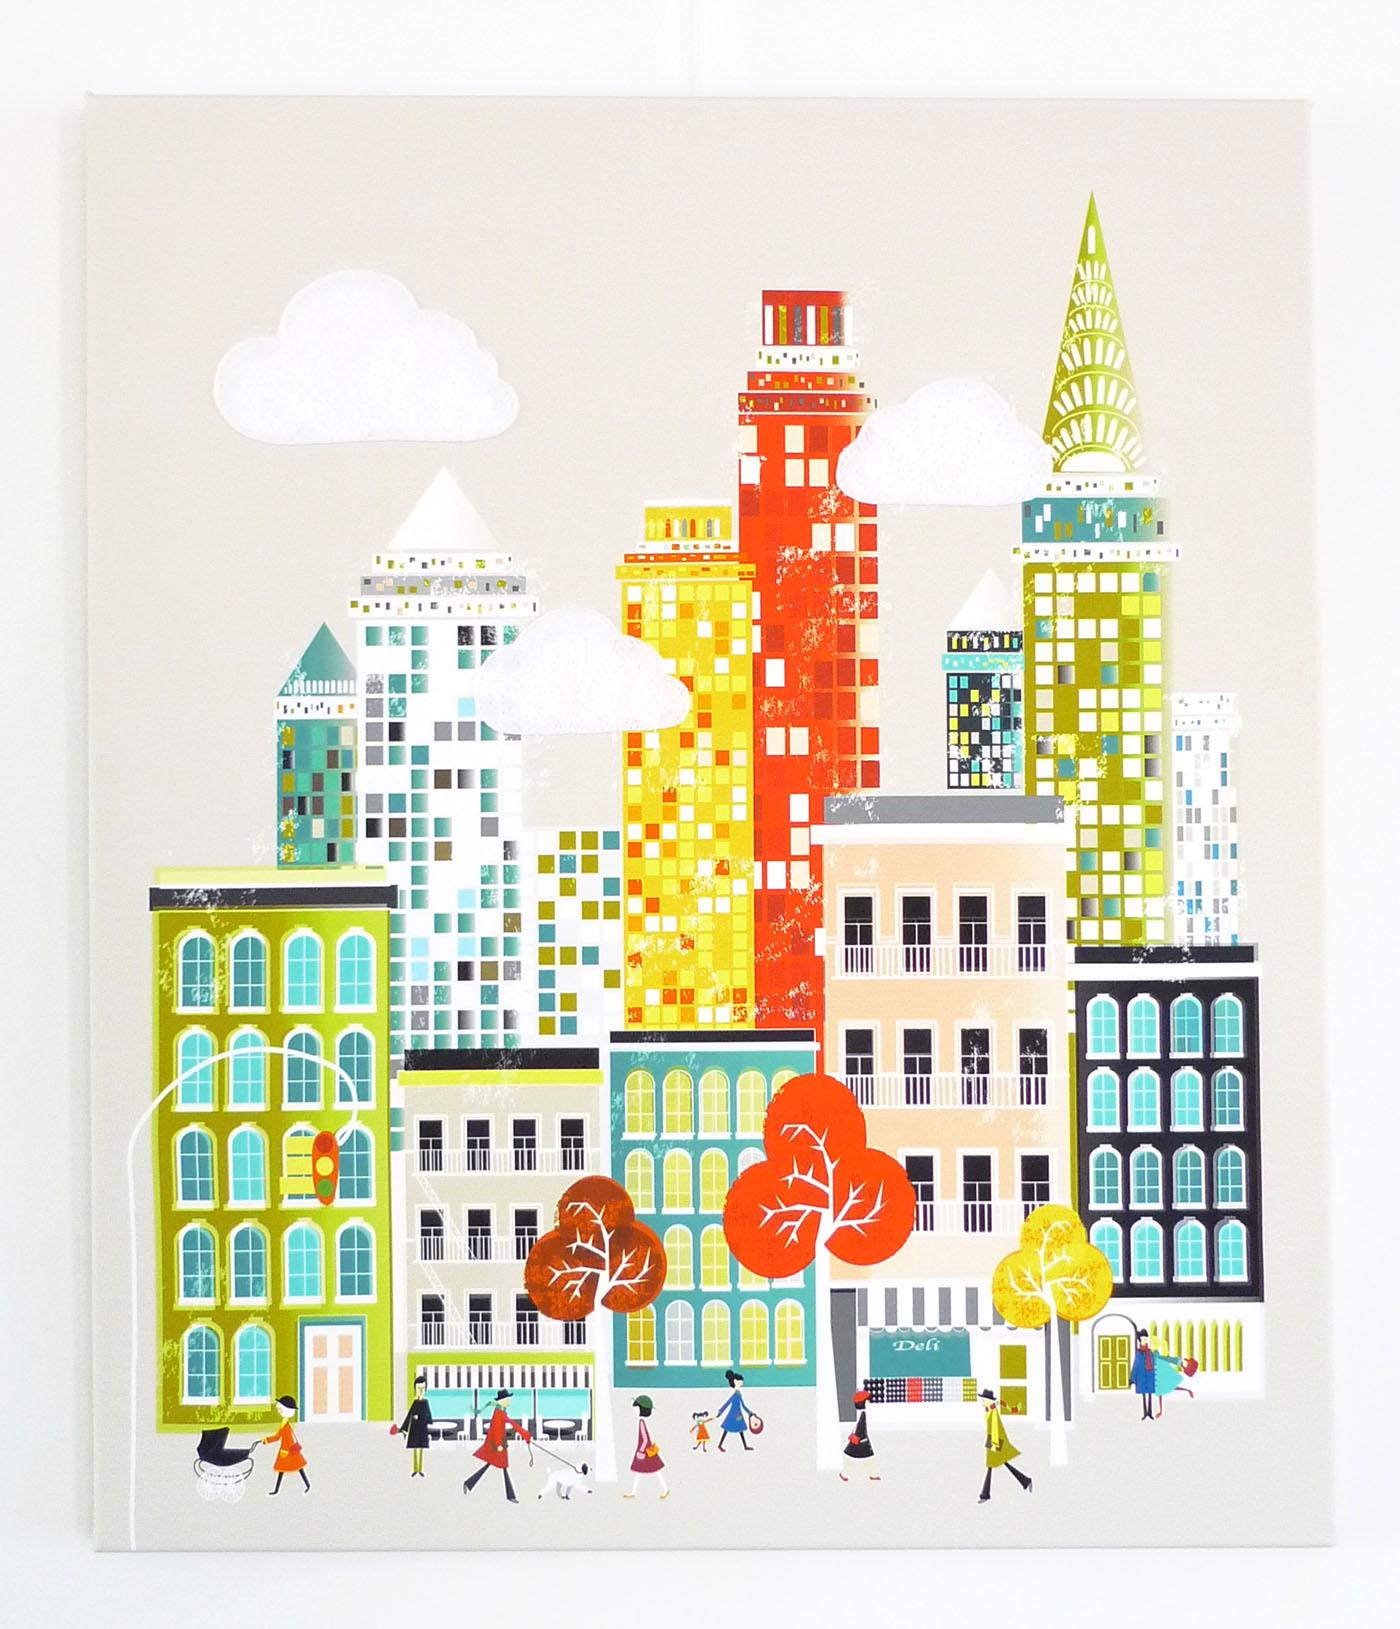 New York Nyc Skyline City Single Canvas Wall Art Picture: New York Wall Art, Manhattan Skyline, Framed Canvas Wall